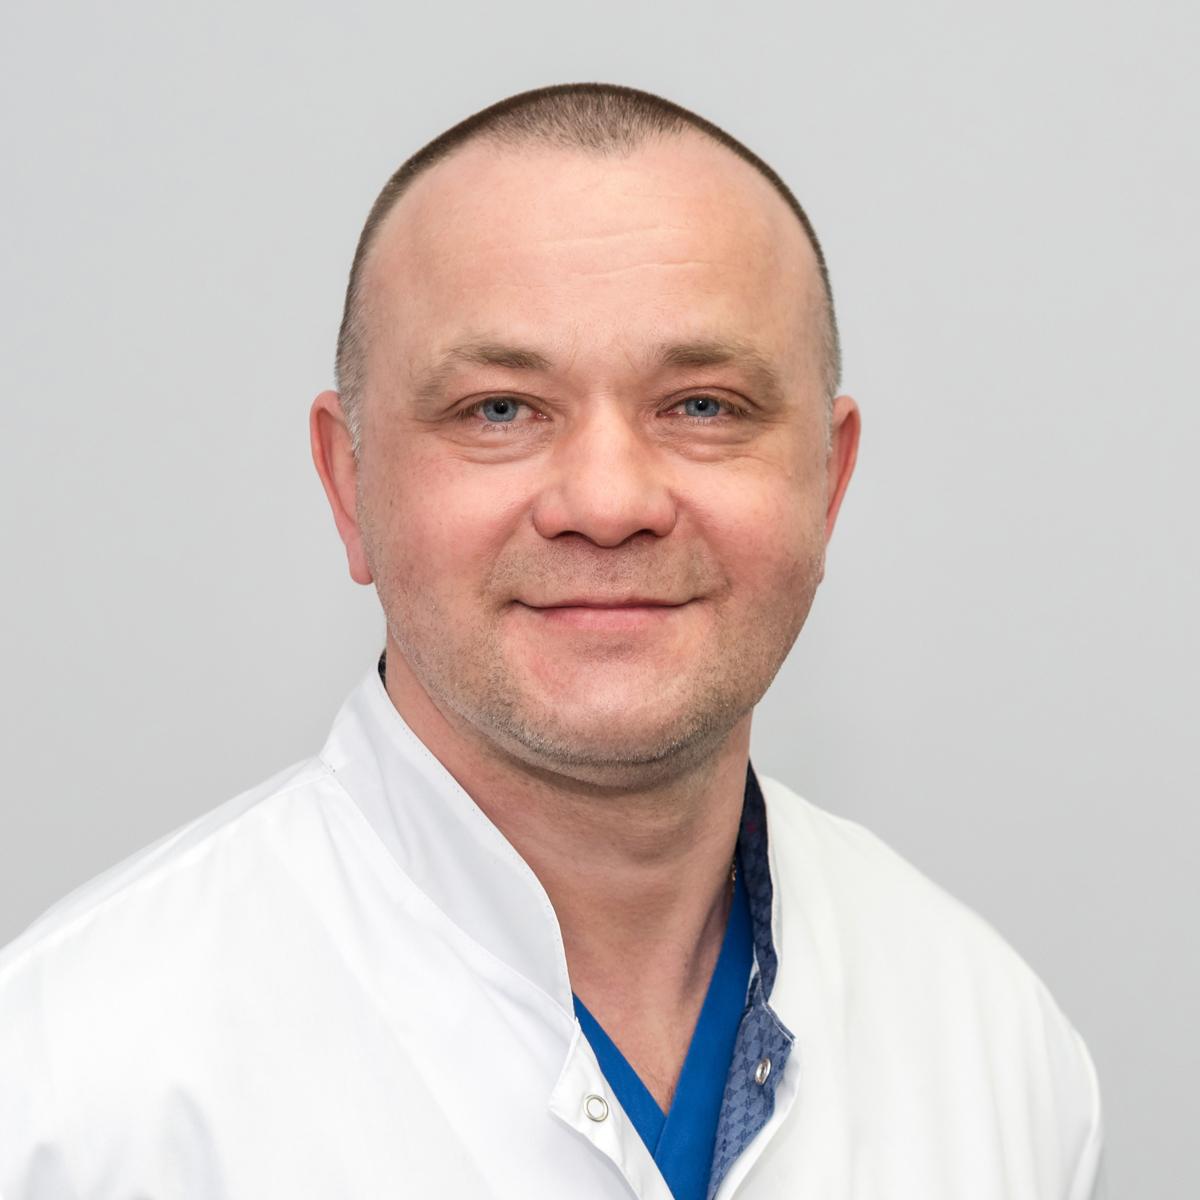 Костюченко Александр Леонидович